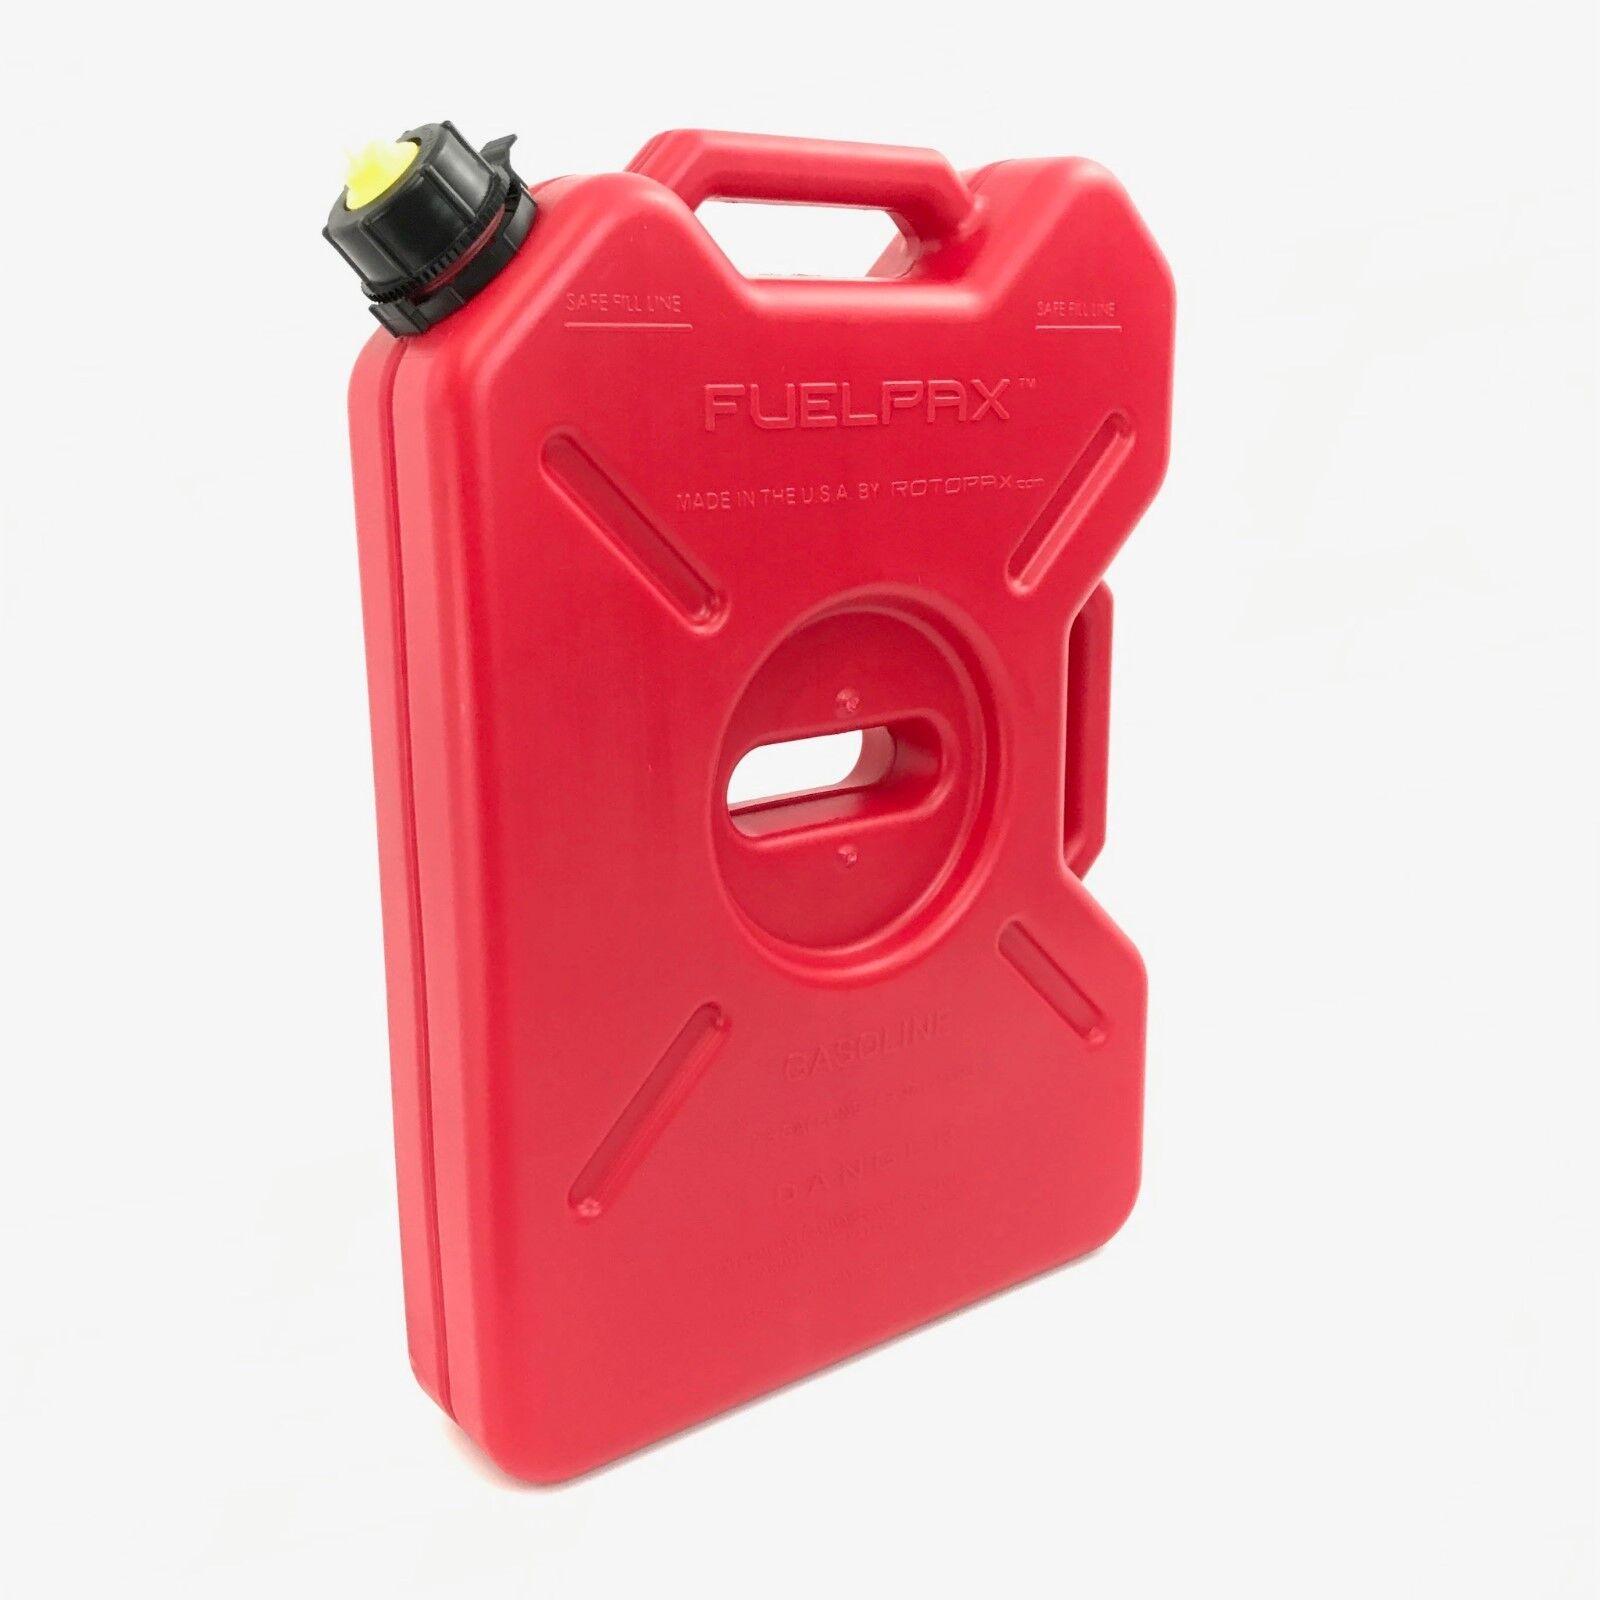 FUELPAX Gasoline Container 2.5 Gallon RotopaX, Kolpin, Jeep, RZR, Polaris